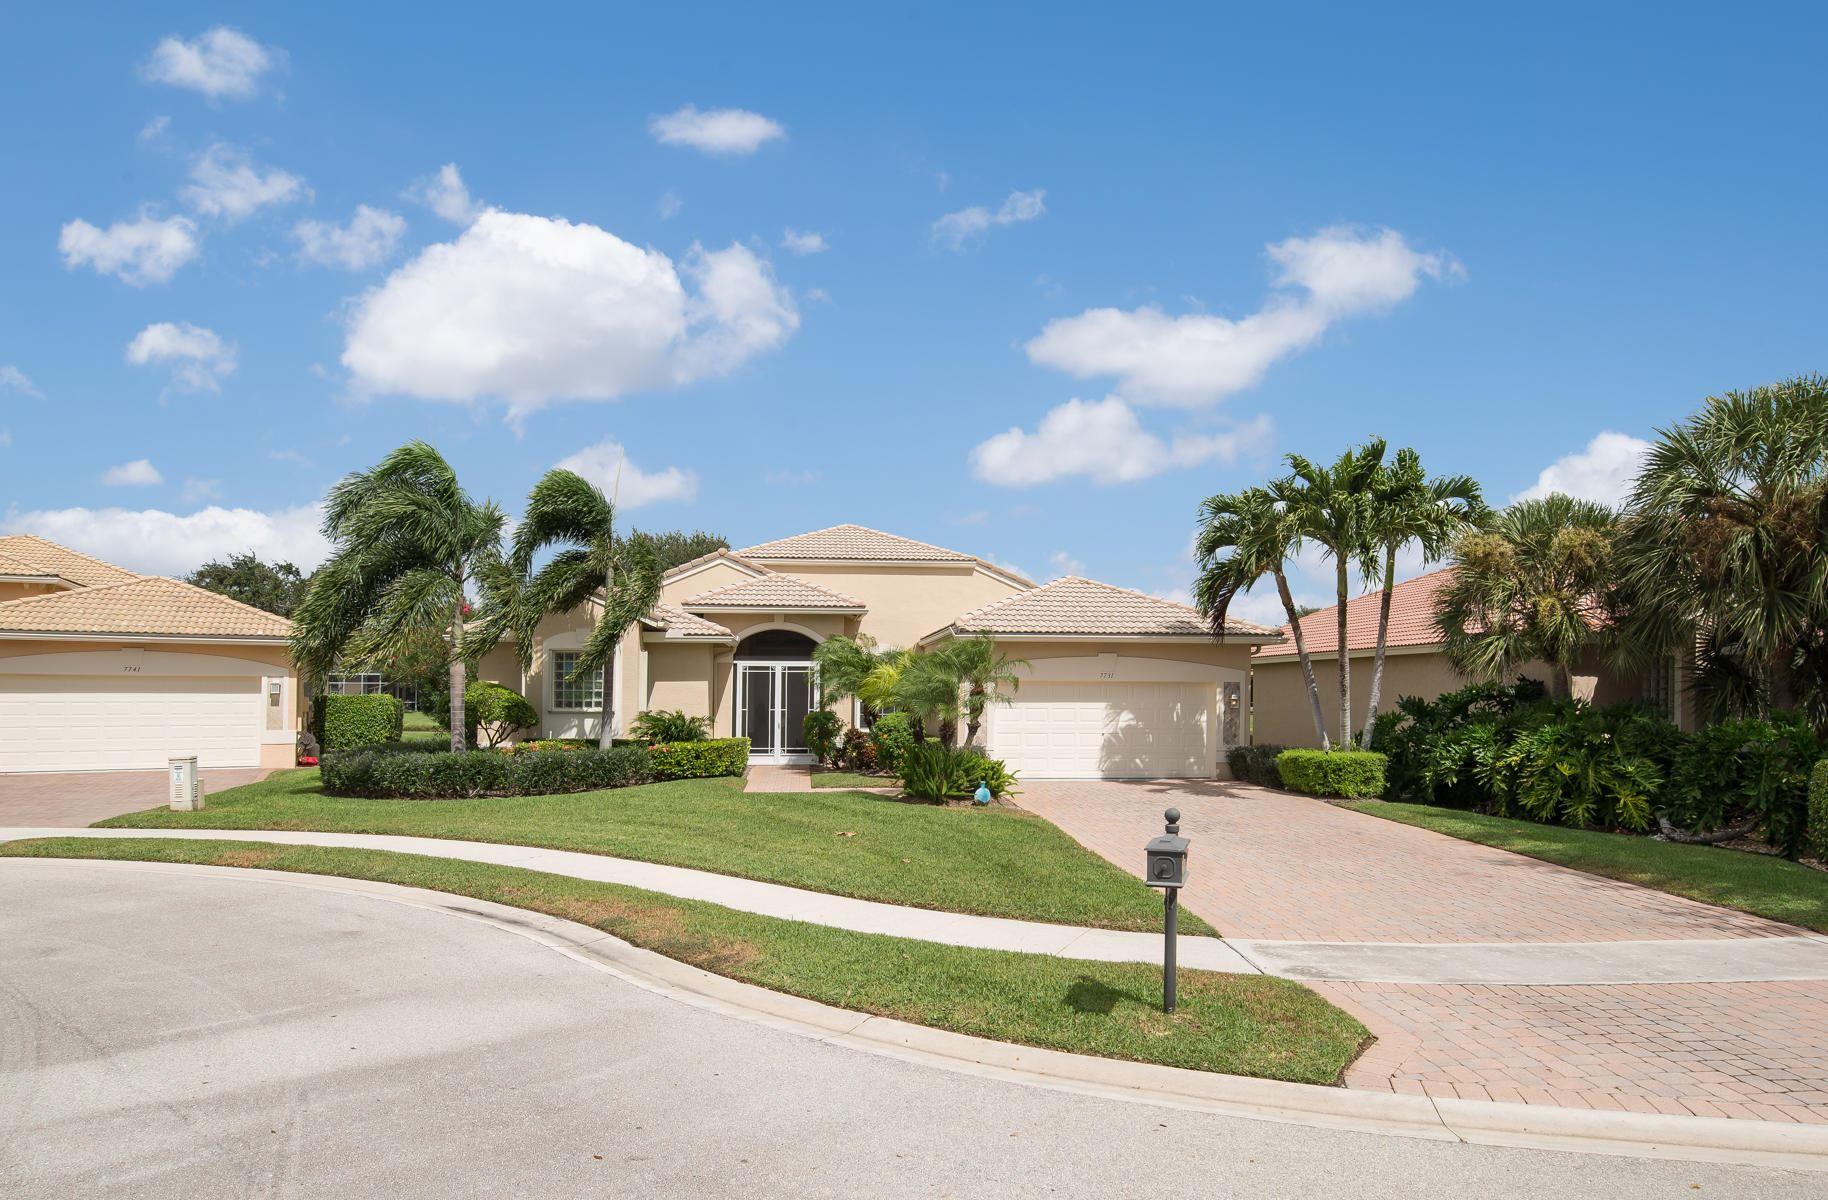 7731 New Ellenton Drive, Boynton Beach, FL 33437 - #: RX-10651495